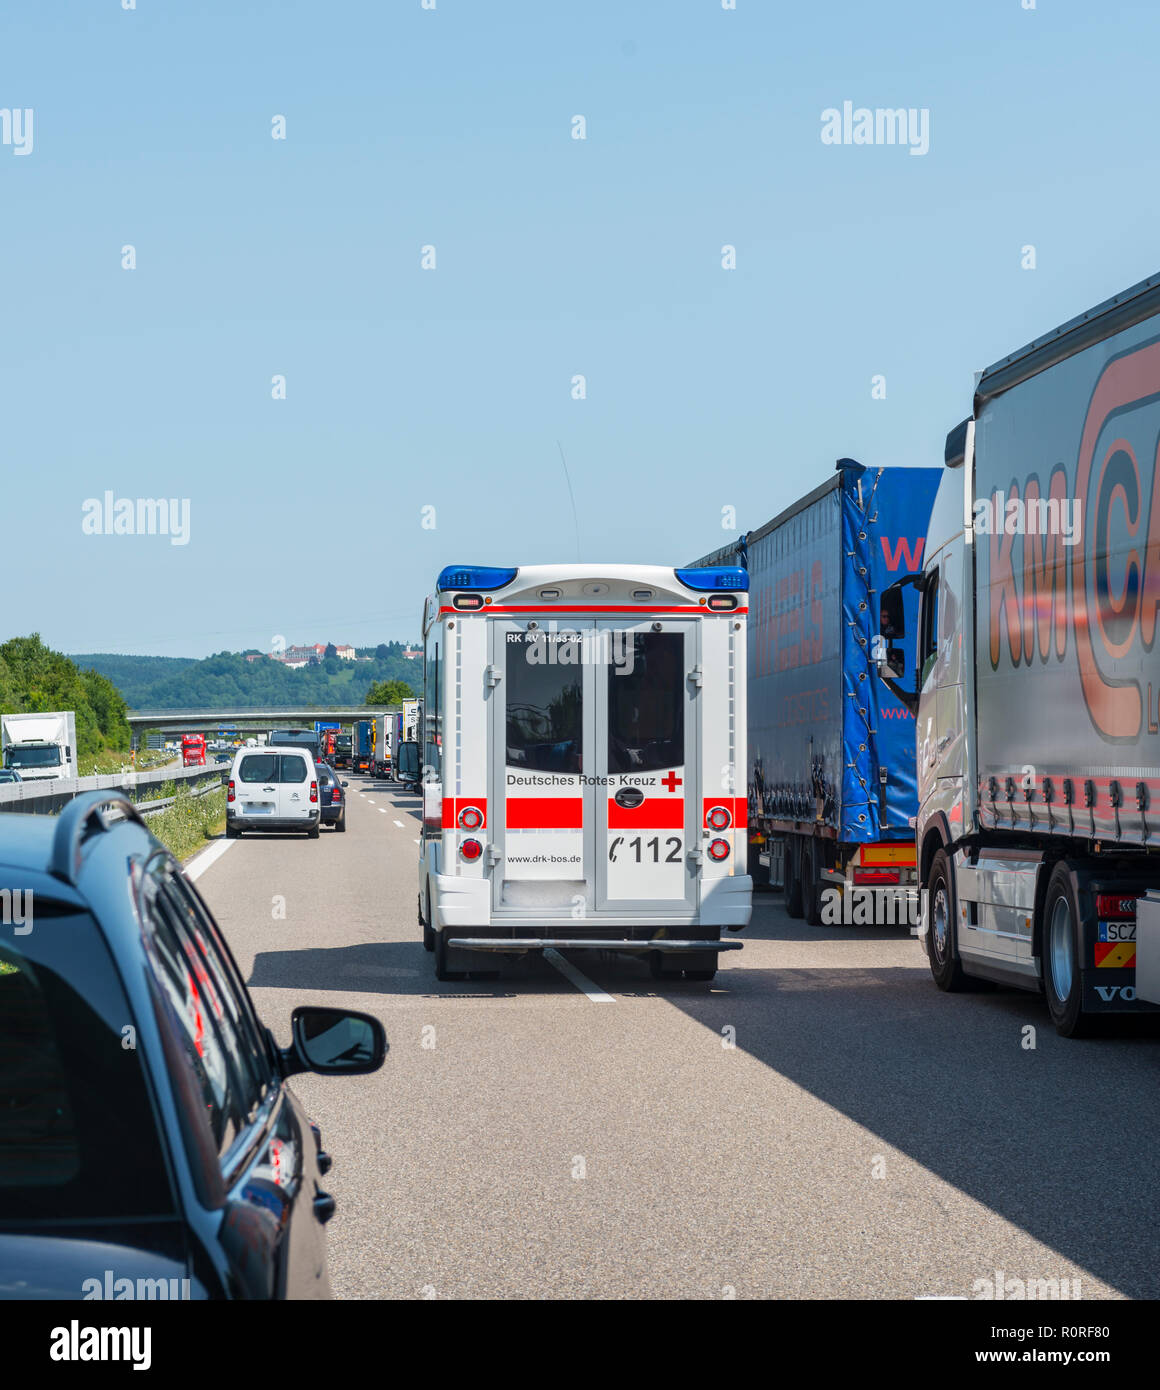 Ambulance drives through rescue lane, traffic jam on motorway, Bavaria, Germany - Stock Image